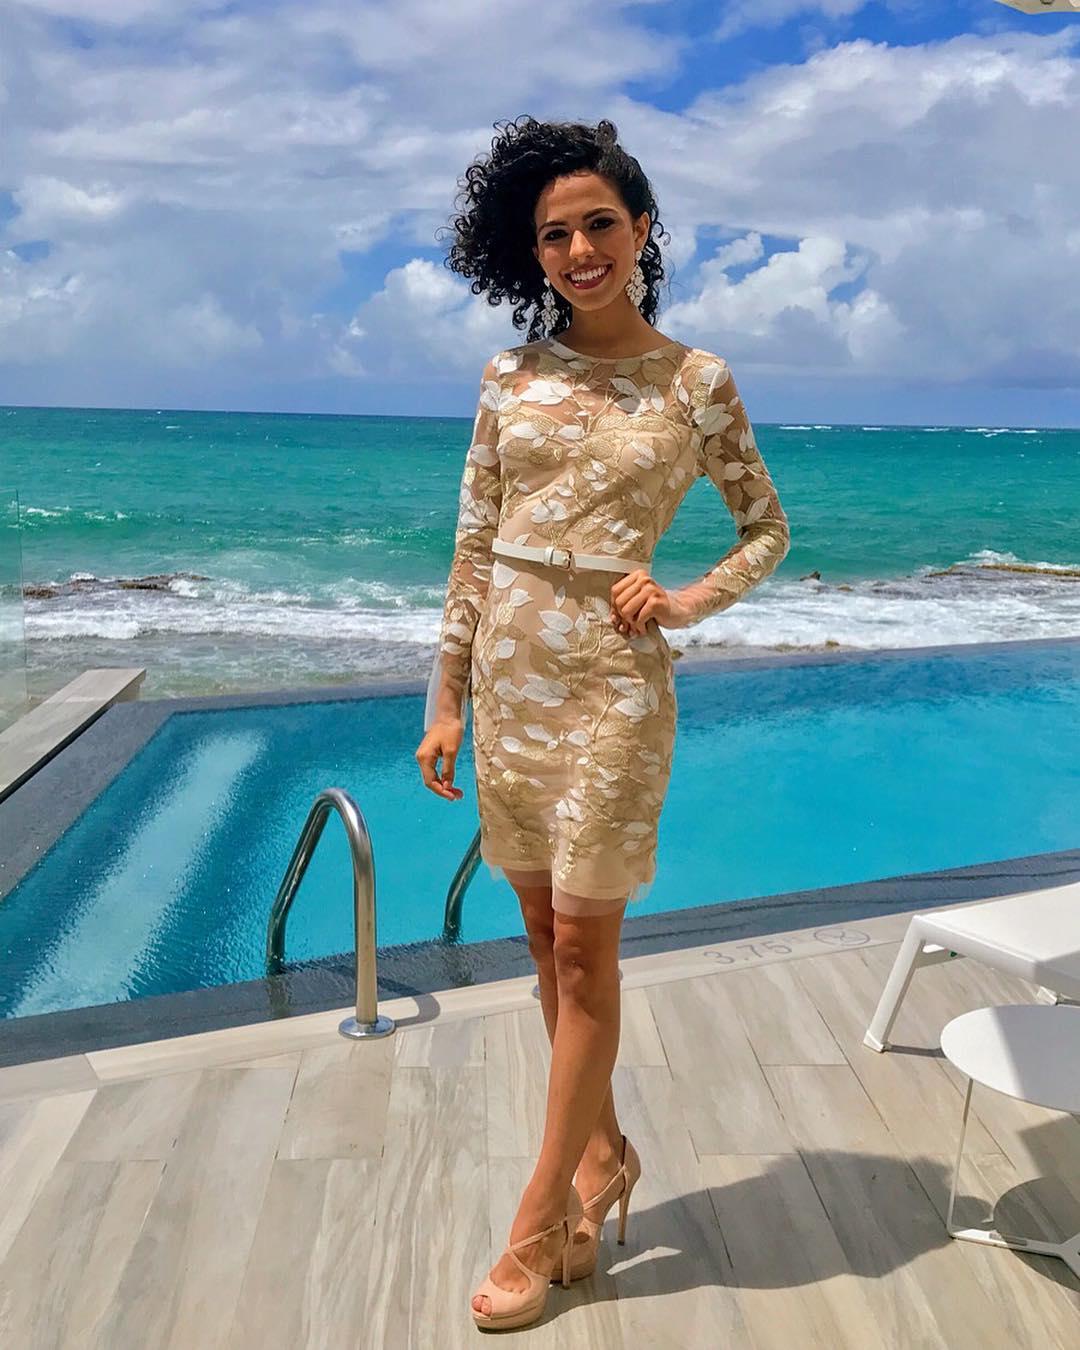 yuanilie alvarado, segunda finalista de reyna hispanoamericana 2019. 32138410